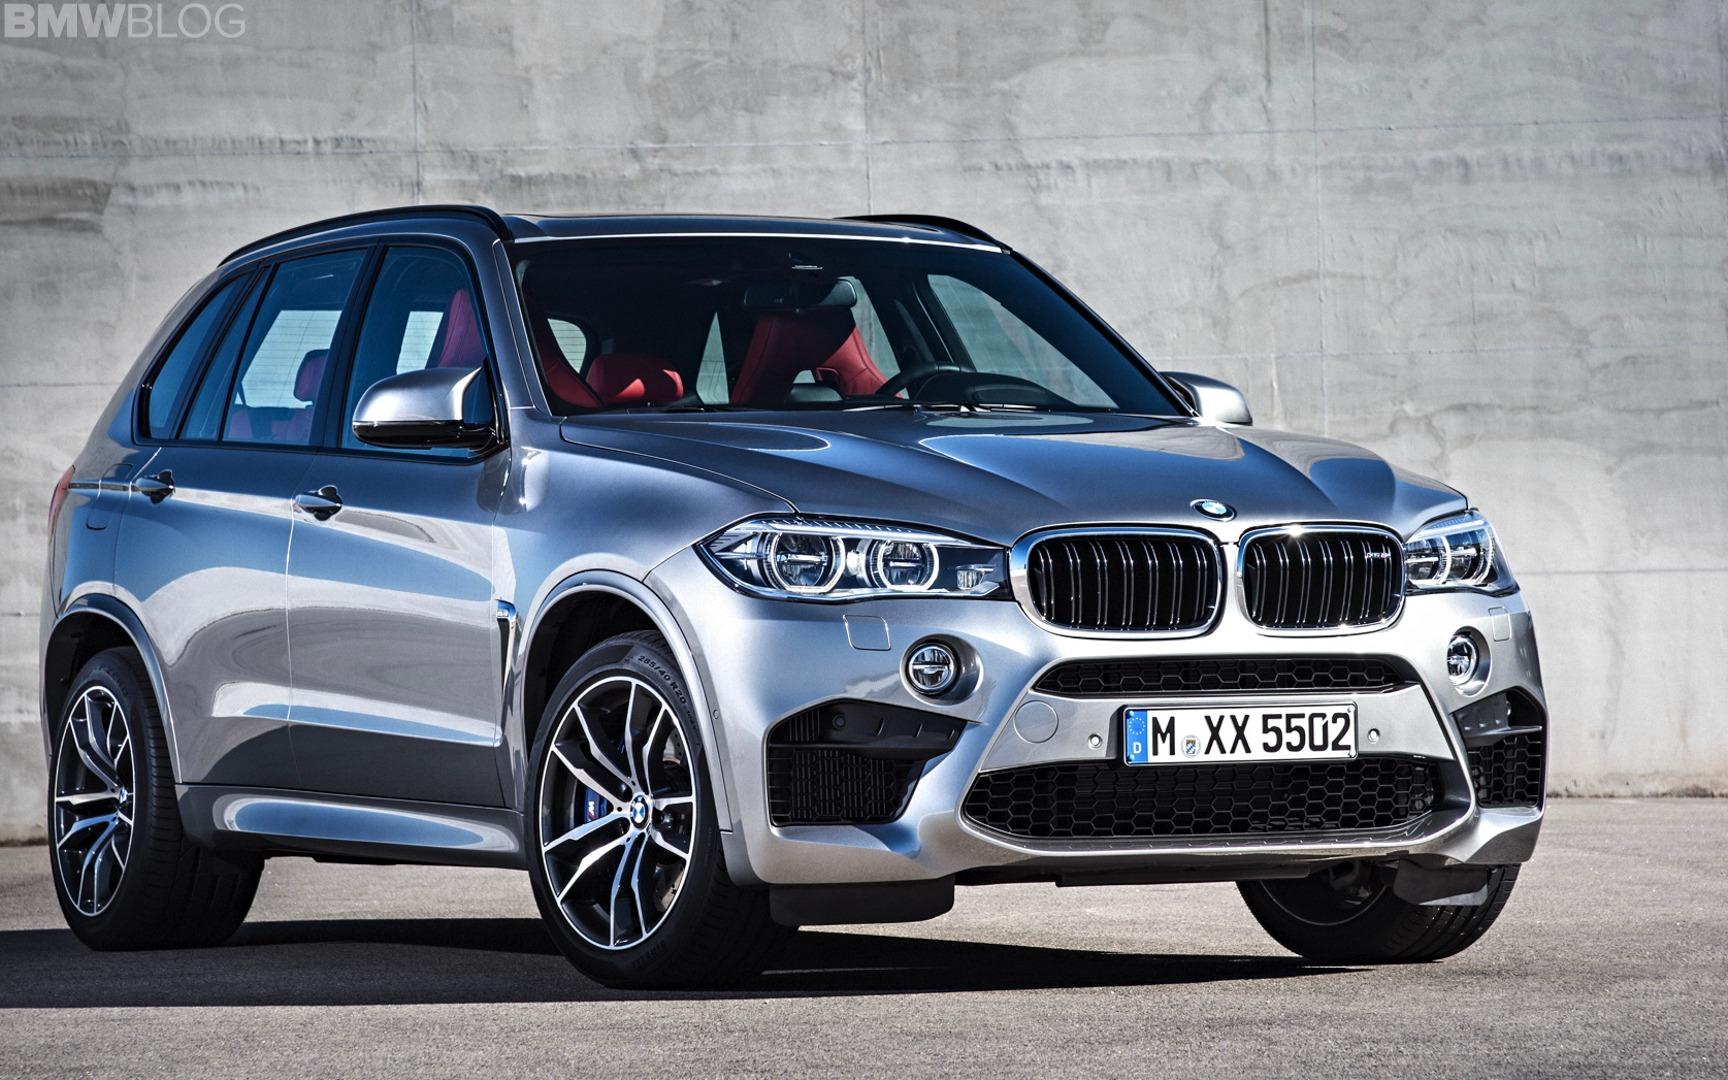 BMW X5 M Comparison 9 of 10